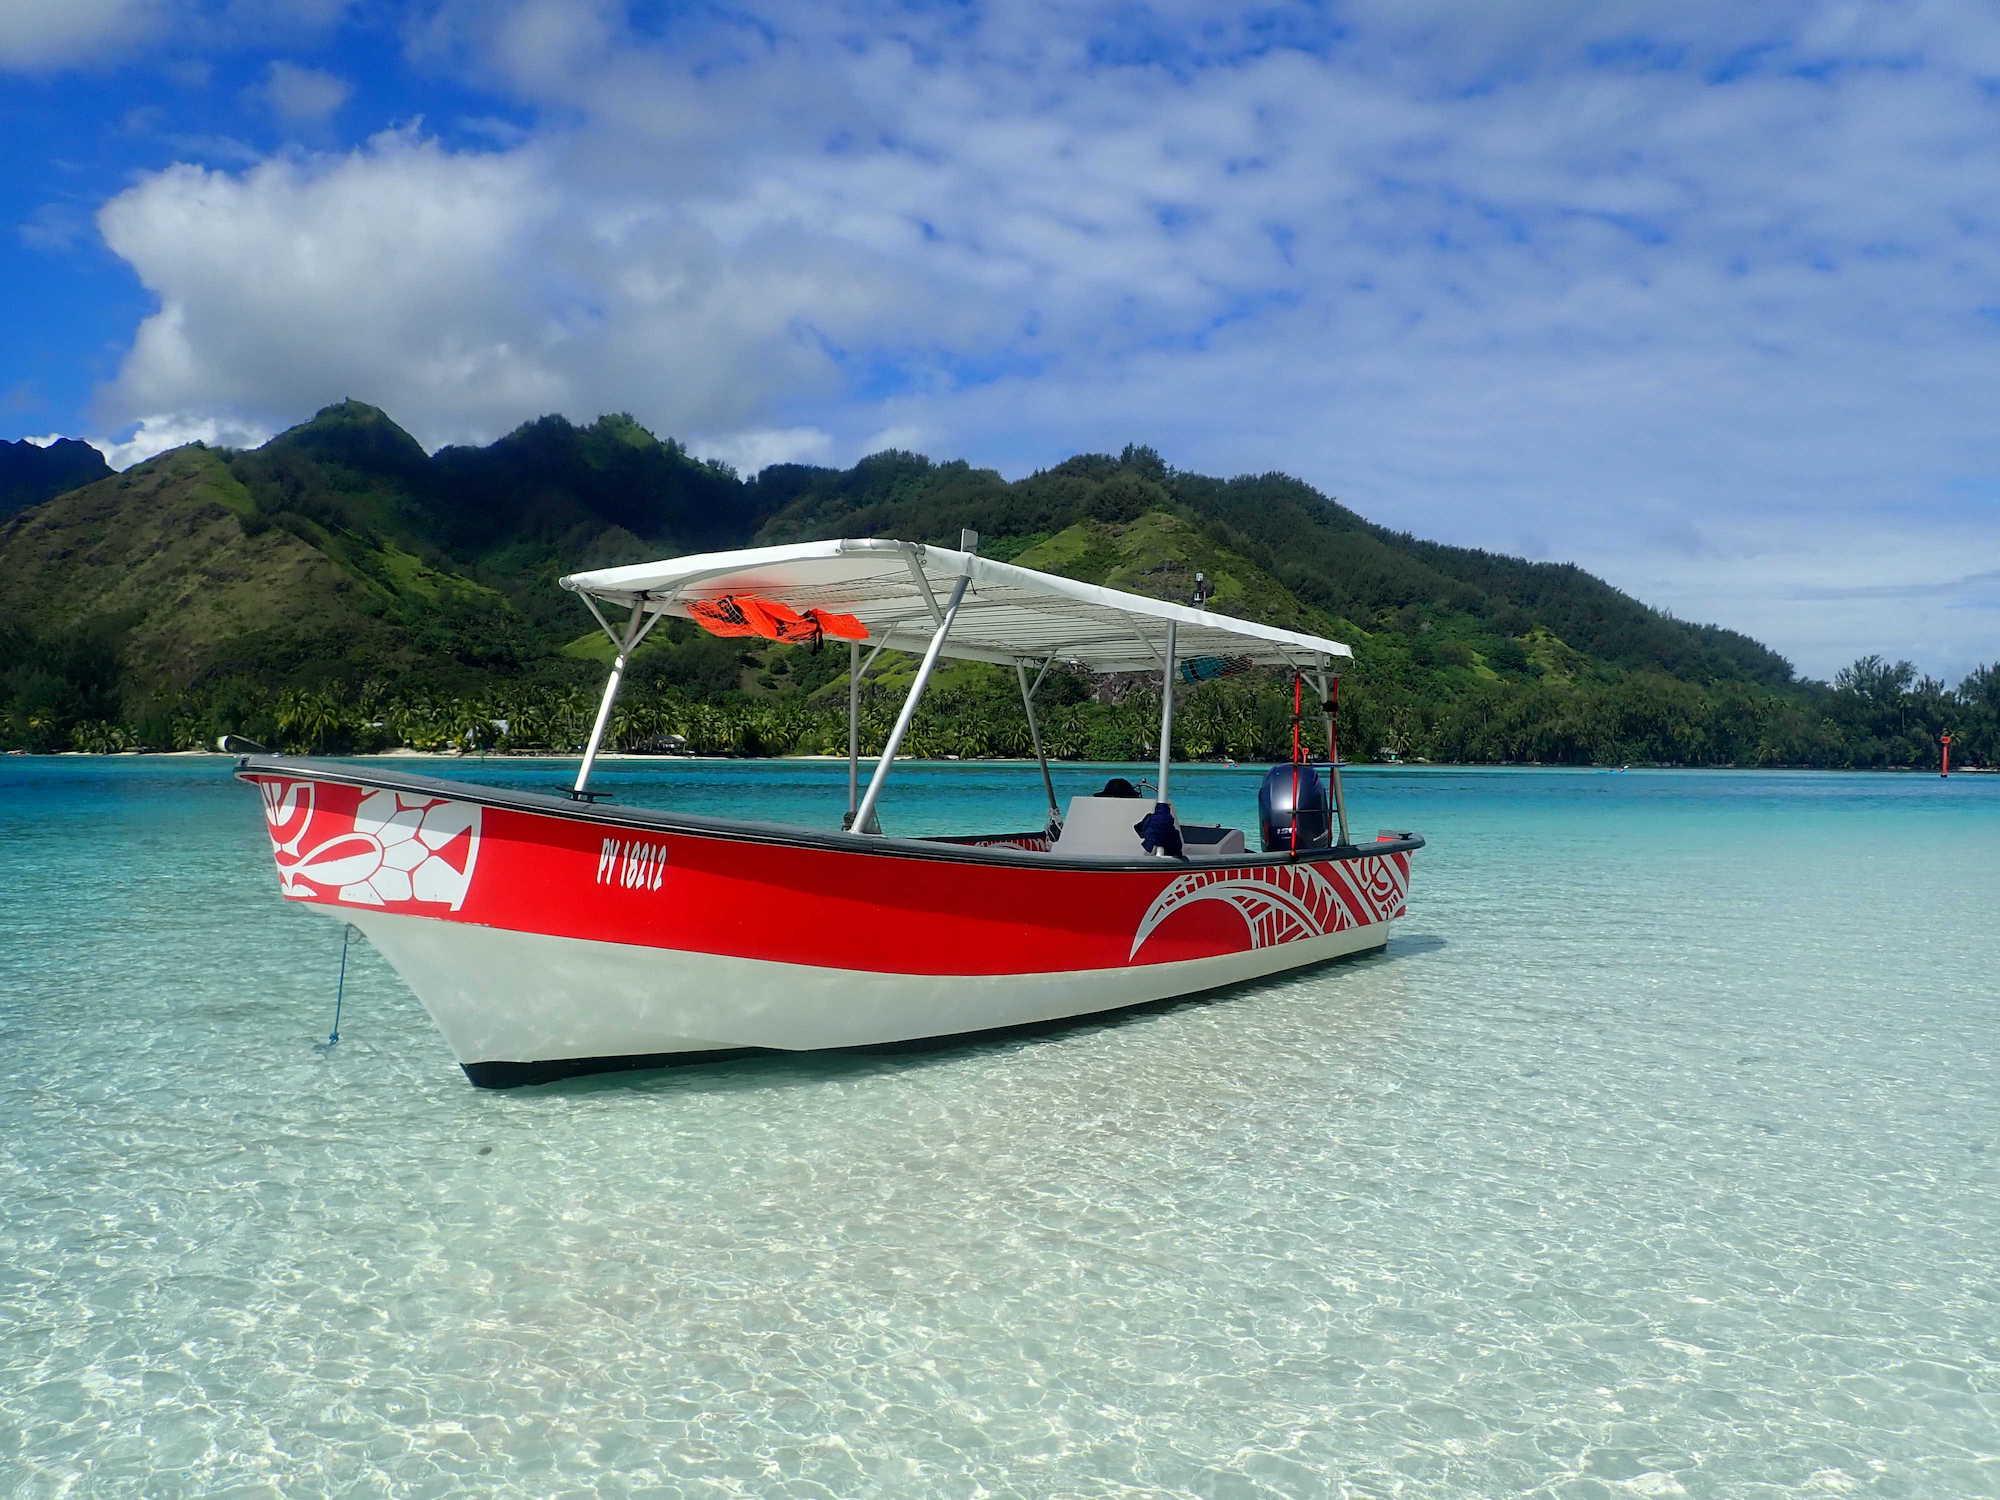 https://tahititourisme.cn/wp-content/uploads/2020/09/Boat-Hinaloa.jpg